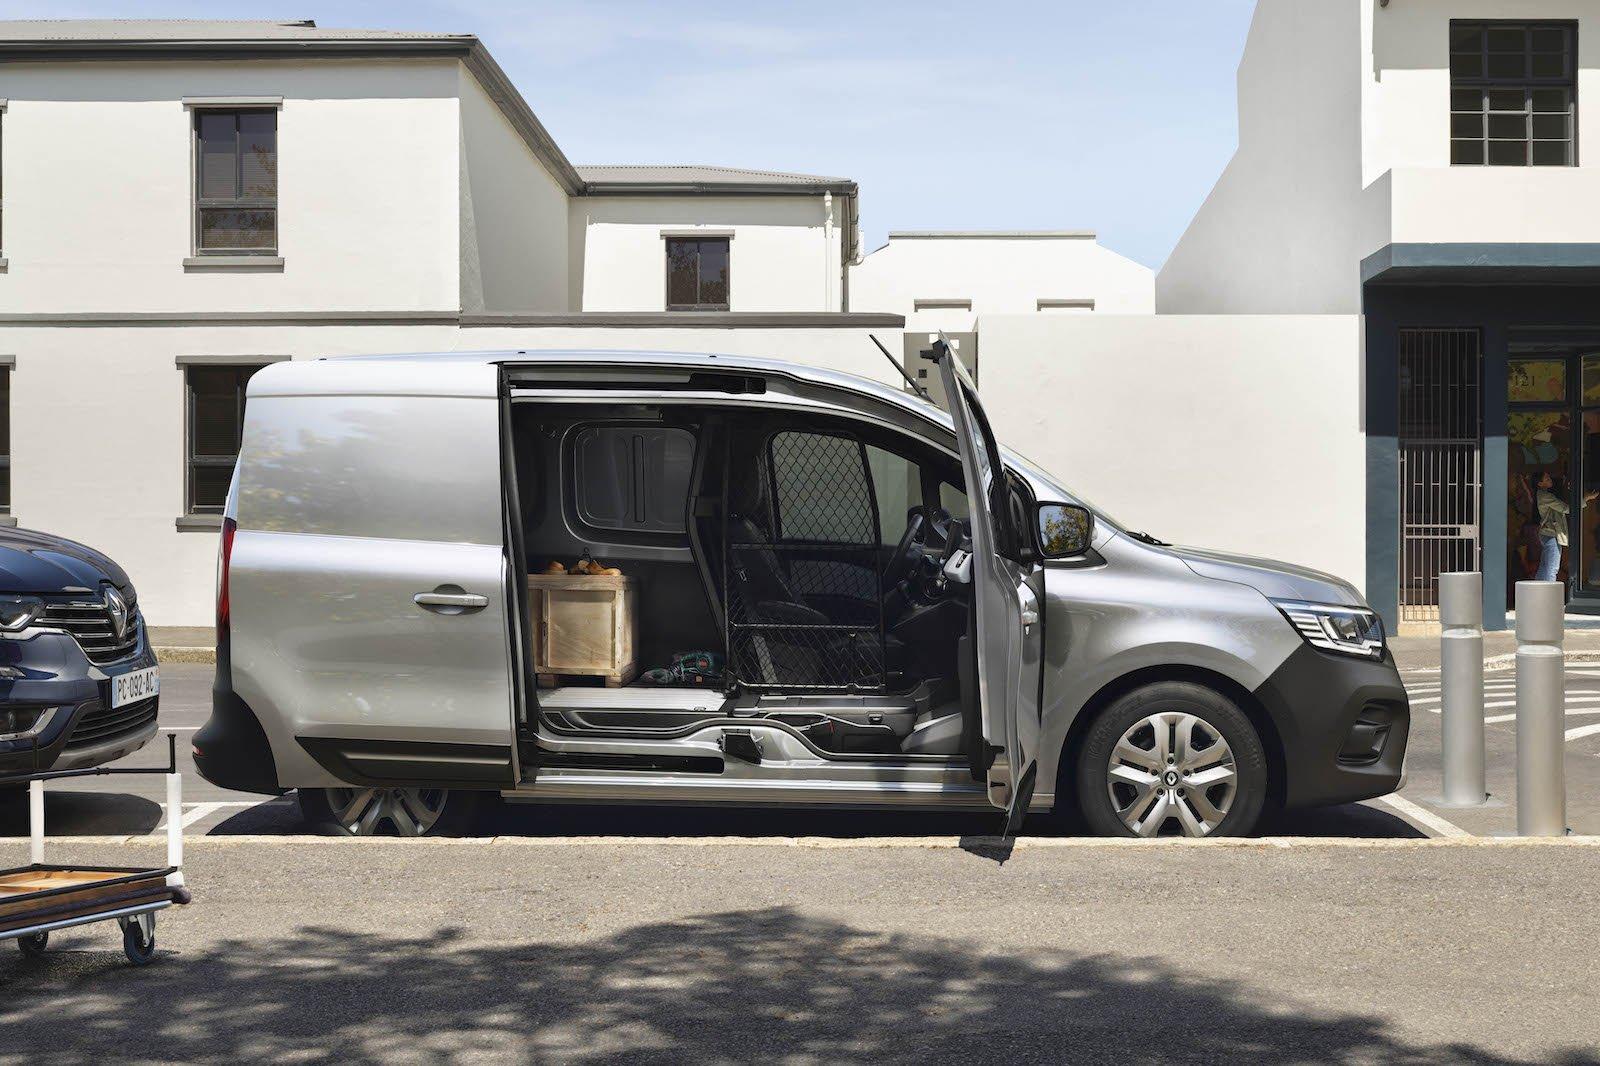 2021 Renault Kangoo Side Profile